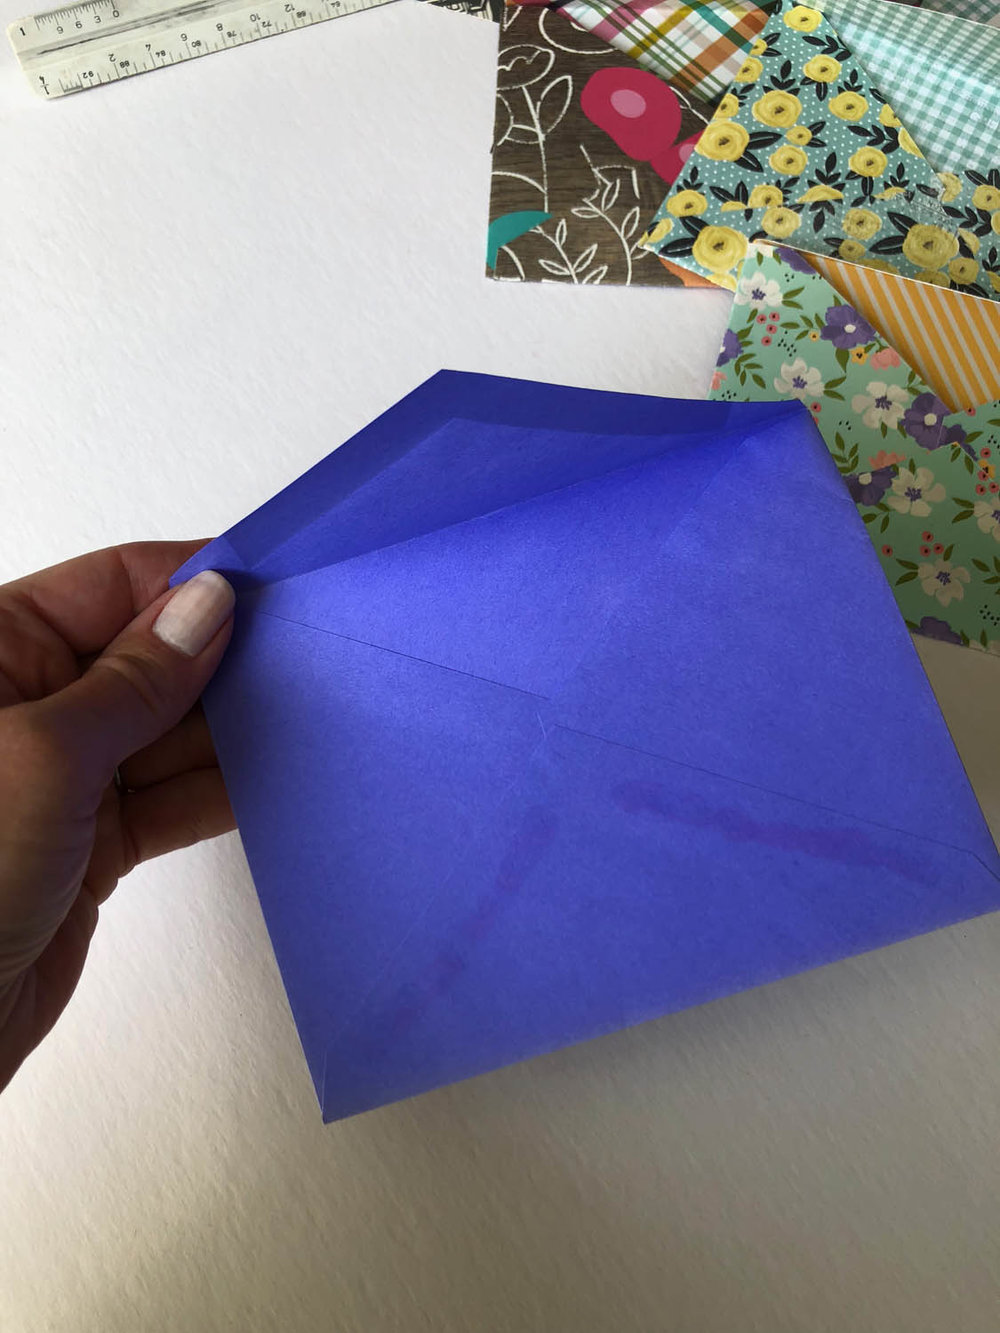 old envelope template for diy envelopes with scrapbook paper